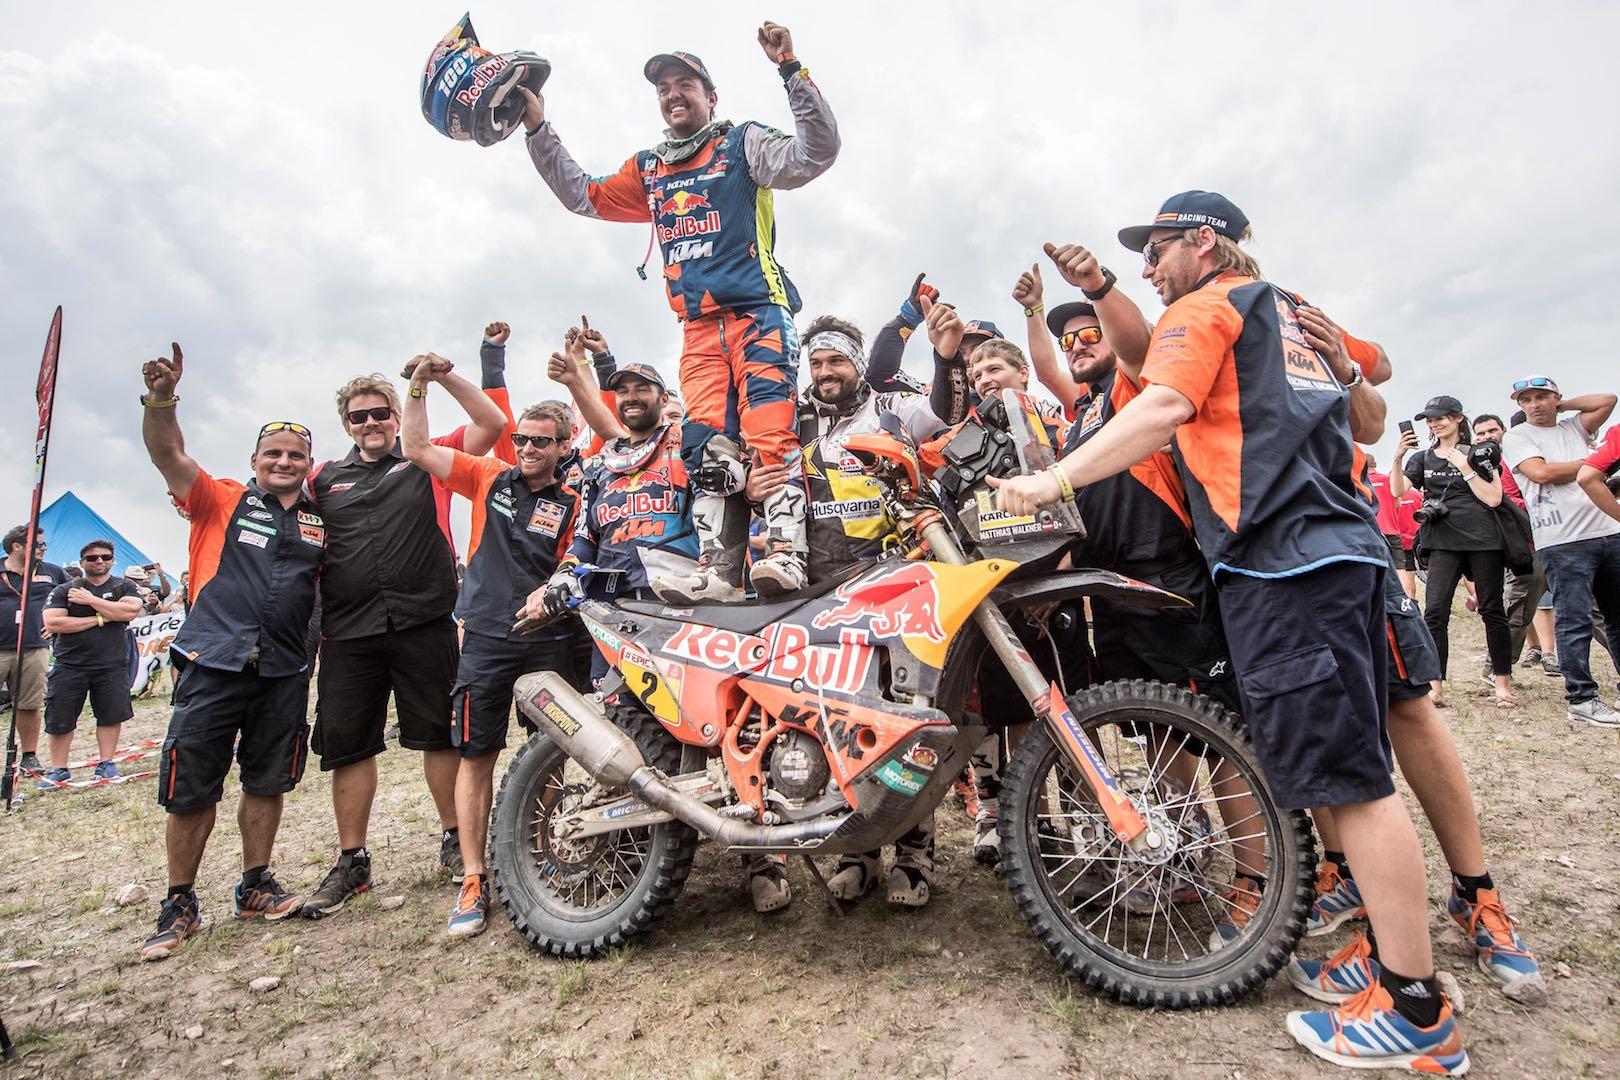 2018 Dakar Rally Motorcycle Results: KTM's Matthias Walkner